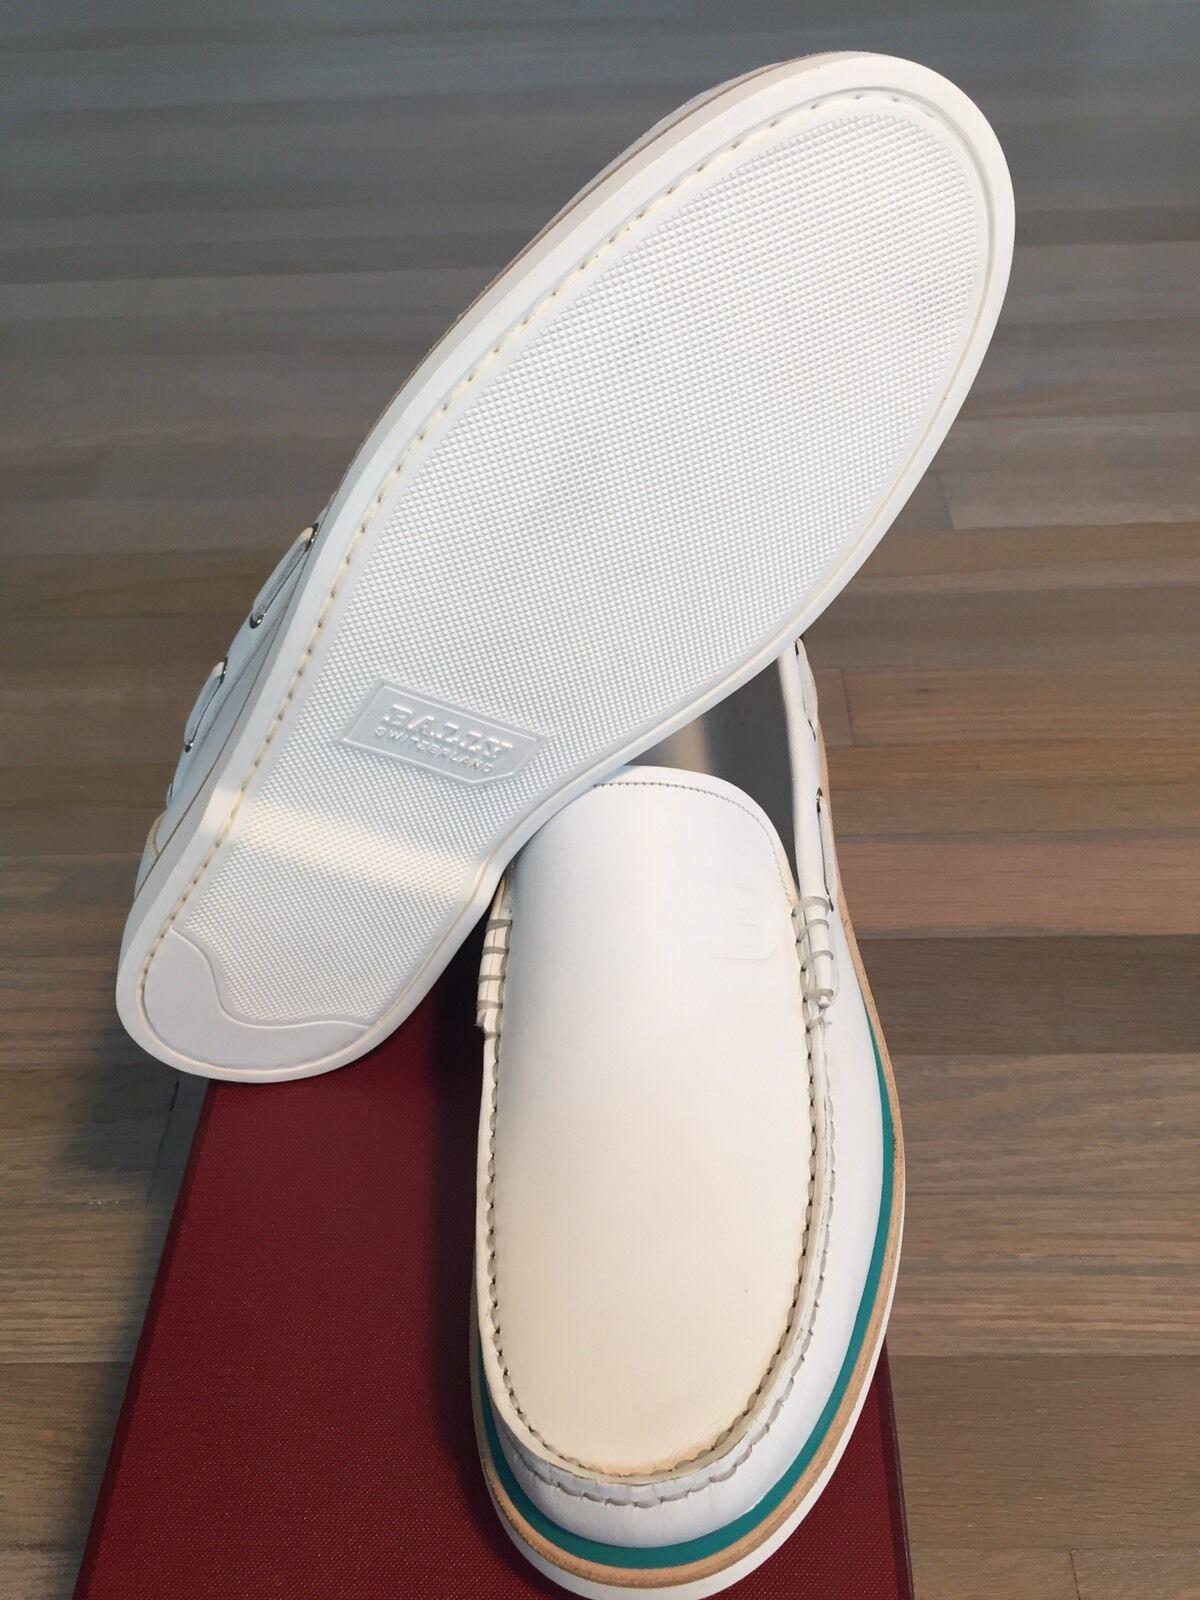 600  Bally Pelle White Boat Shoes size US Switzerland 11 Made in Switzerland US 7b6468